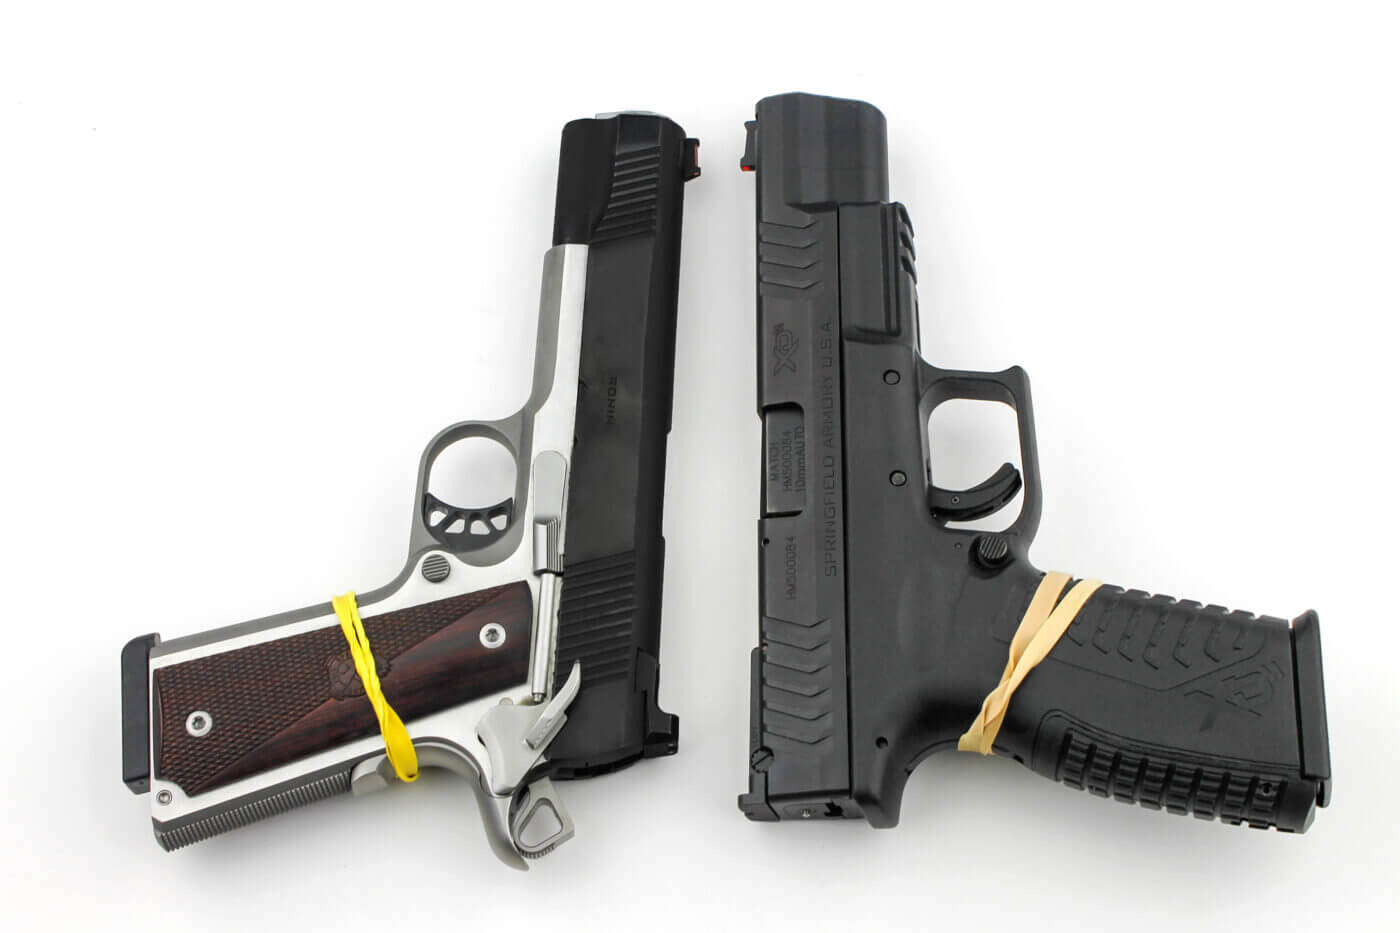 Examples of bad gun modifications